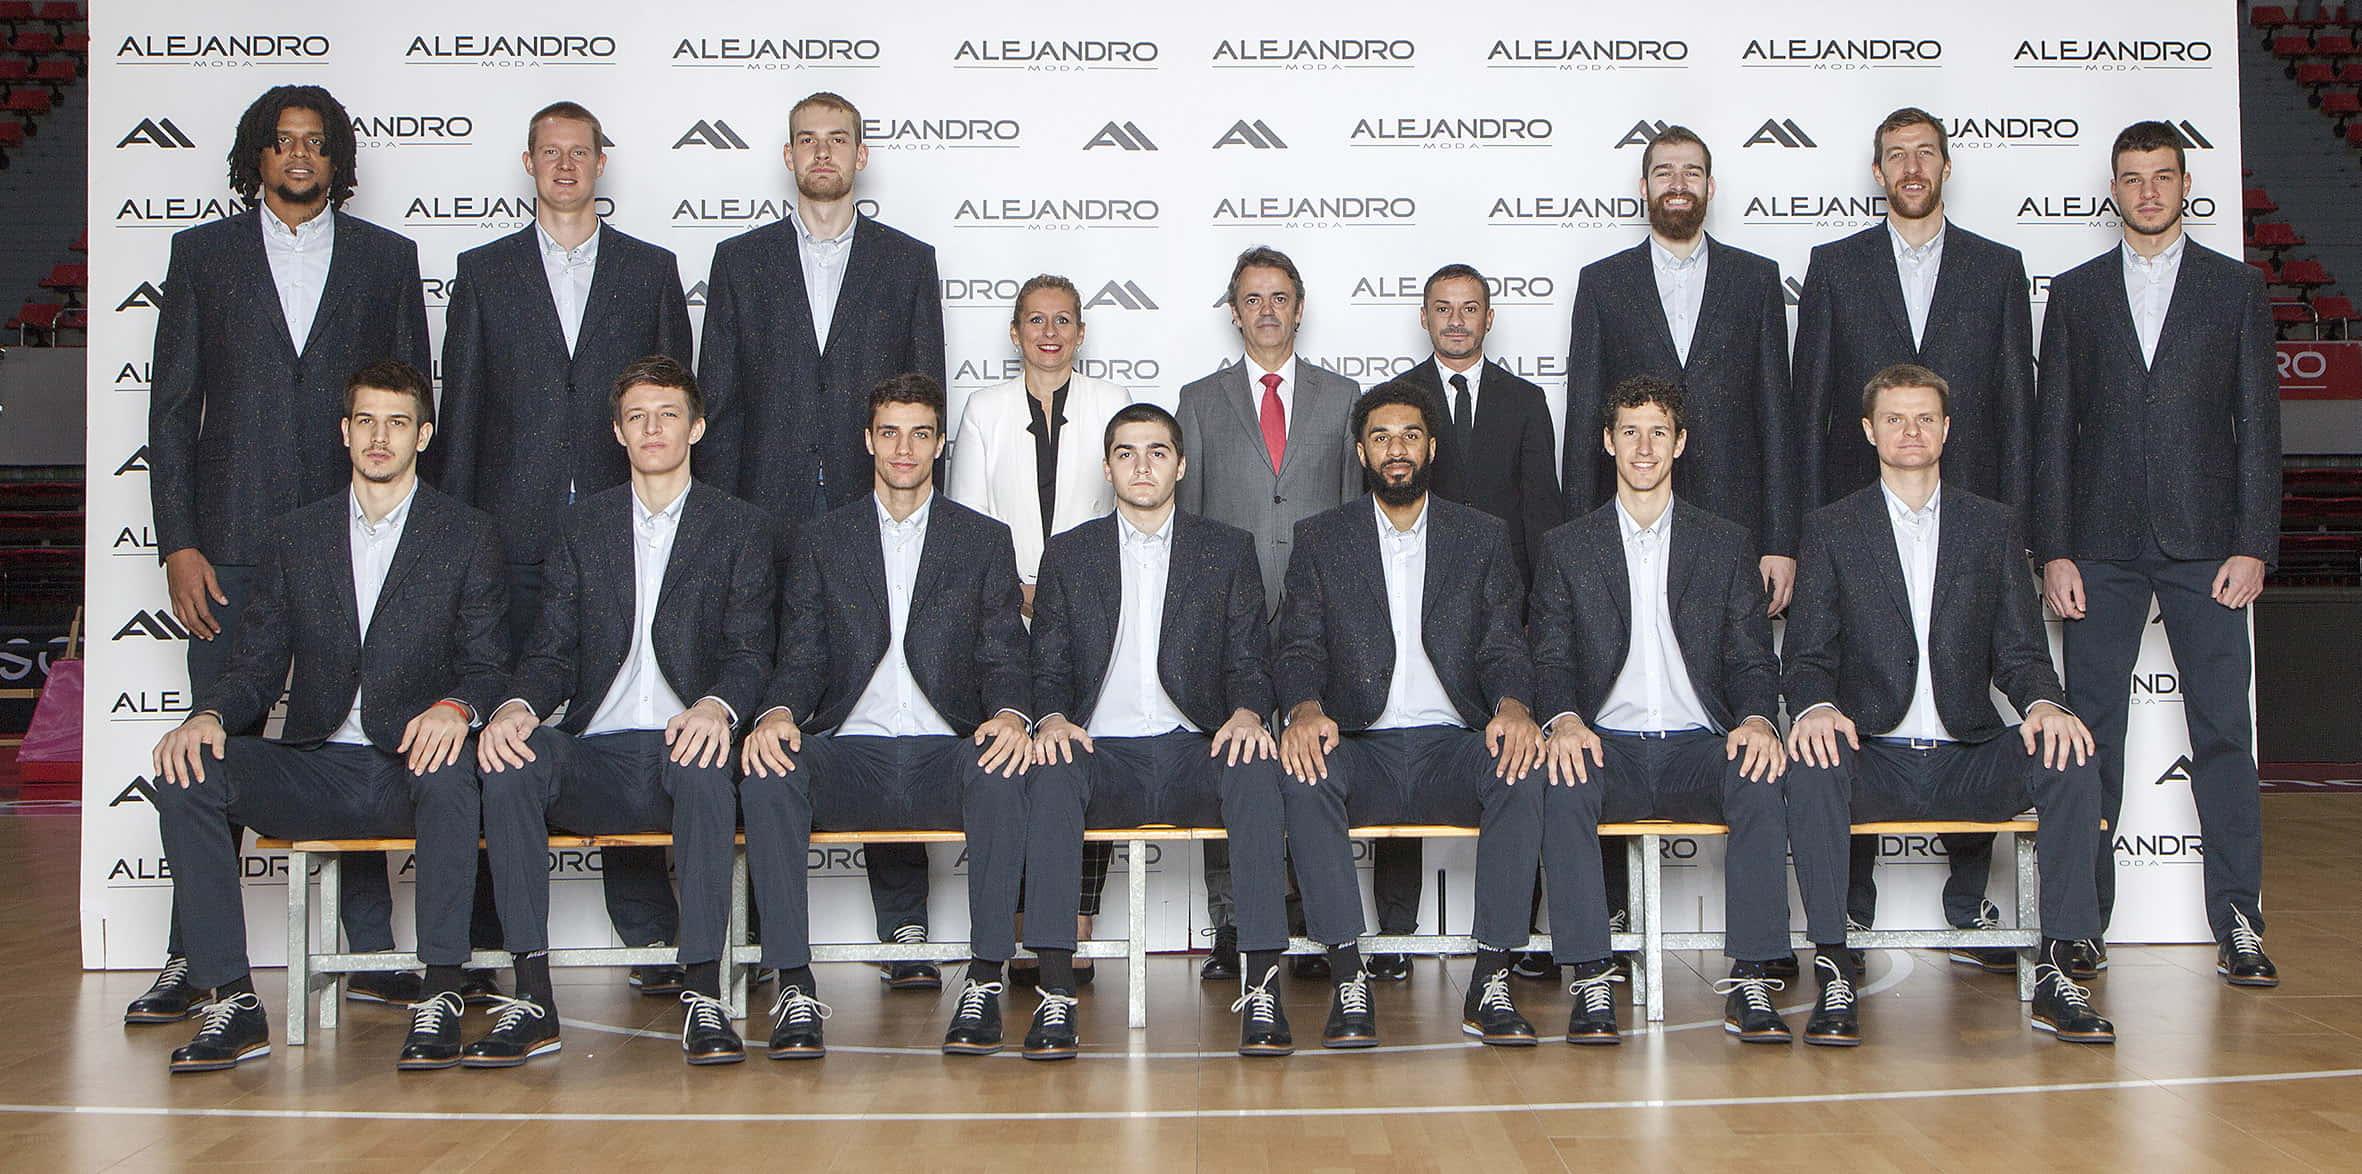 Presentación Casademont Basket Zaragoza Alejandro Moda